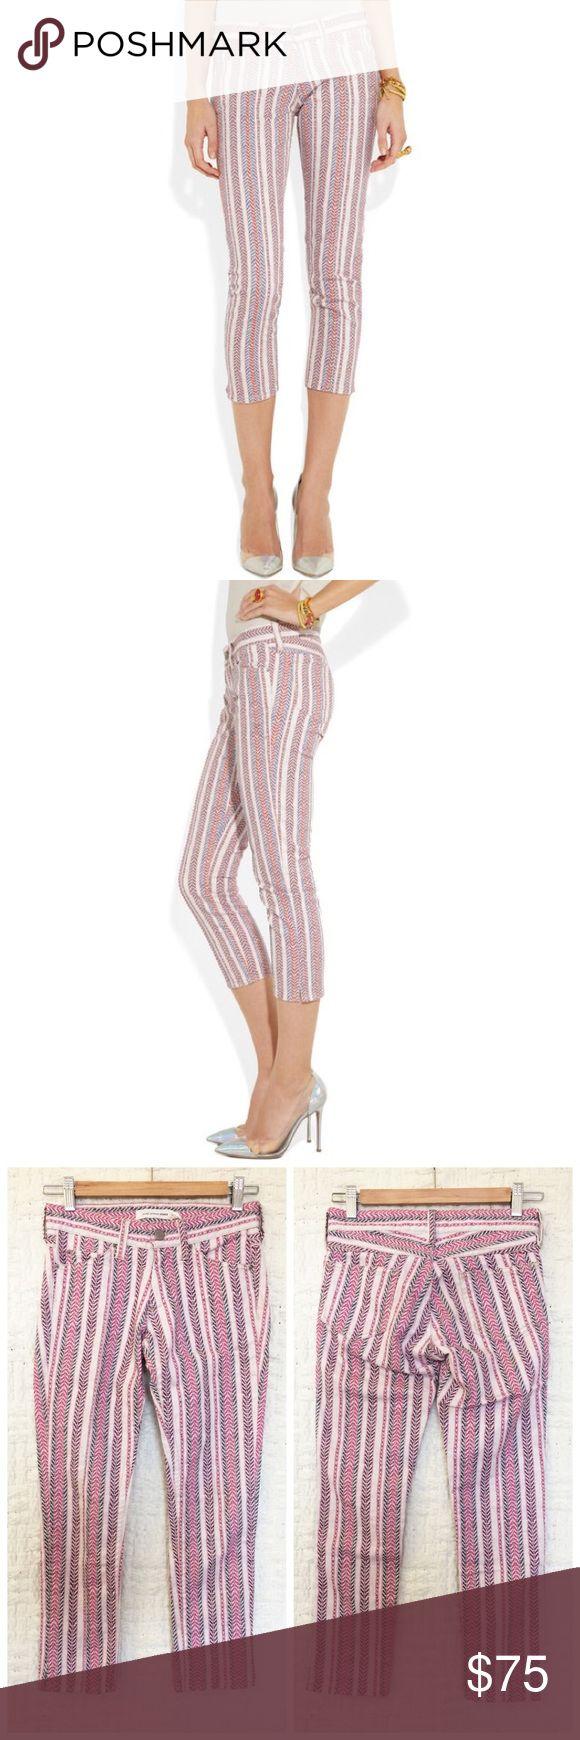 "Isabel Marant Cooper Printed Skinny Jeans Isabel Marant Cooper Printed Skinny Jeans size 34 / US size 4.  Waist measures 26"", rise measures 7"", inseam measures 23"".  No trades / modeling. Isabel Marant Jeans Skinny"